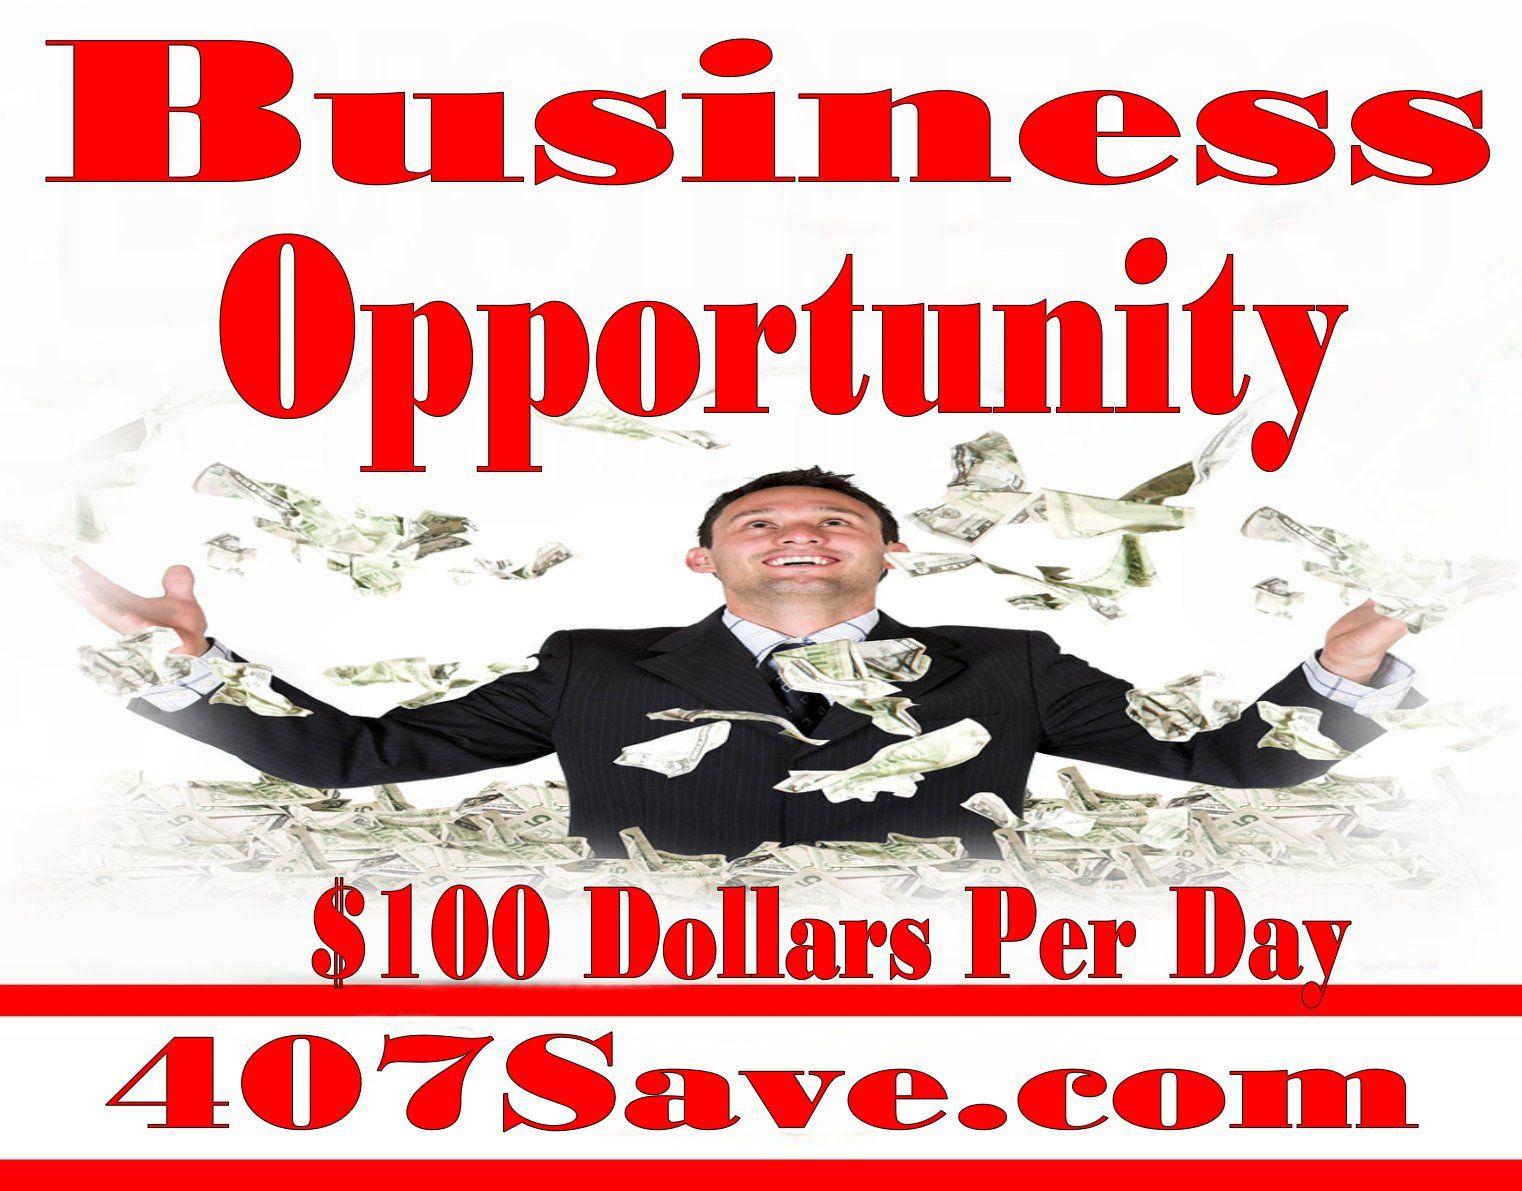 407 Save Fundraiser Card 407-309-6565        orlandobusinessdirectory@gmail.com